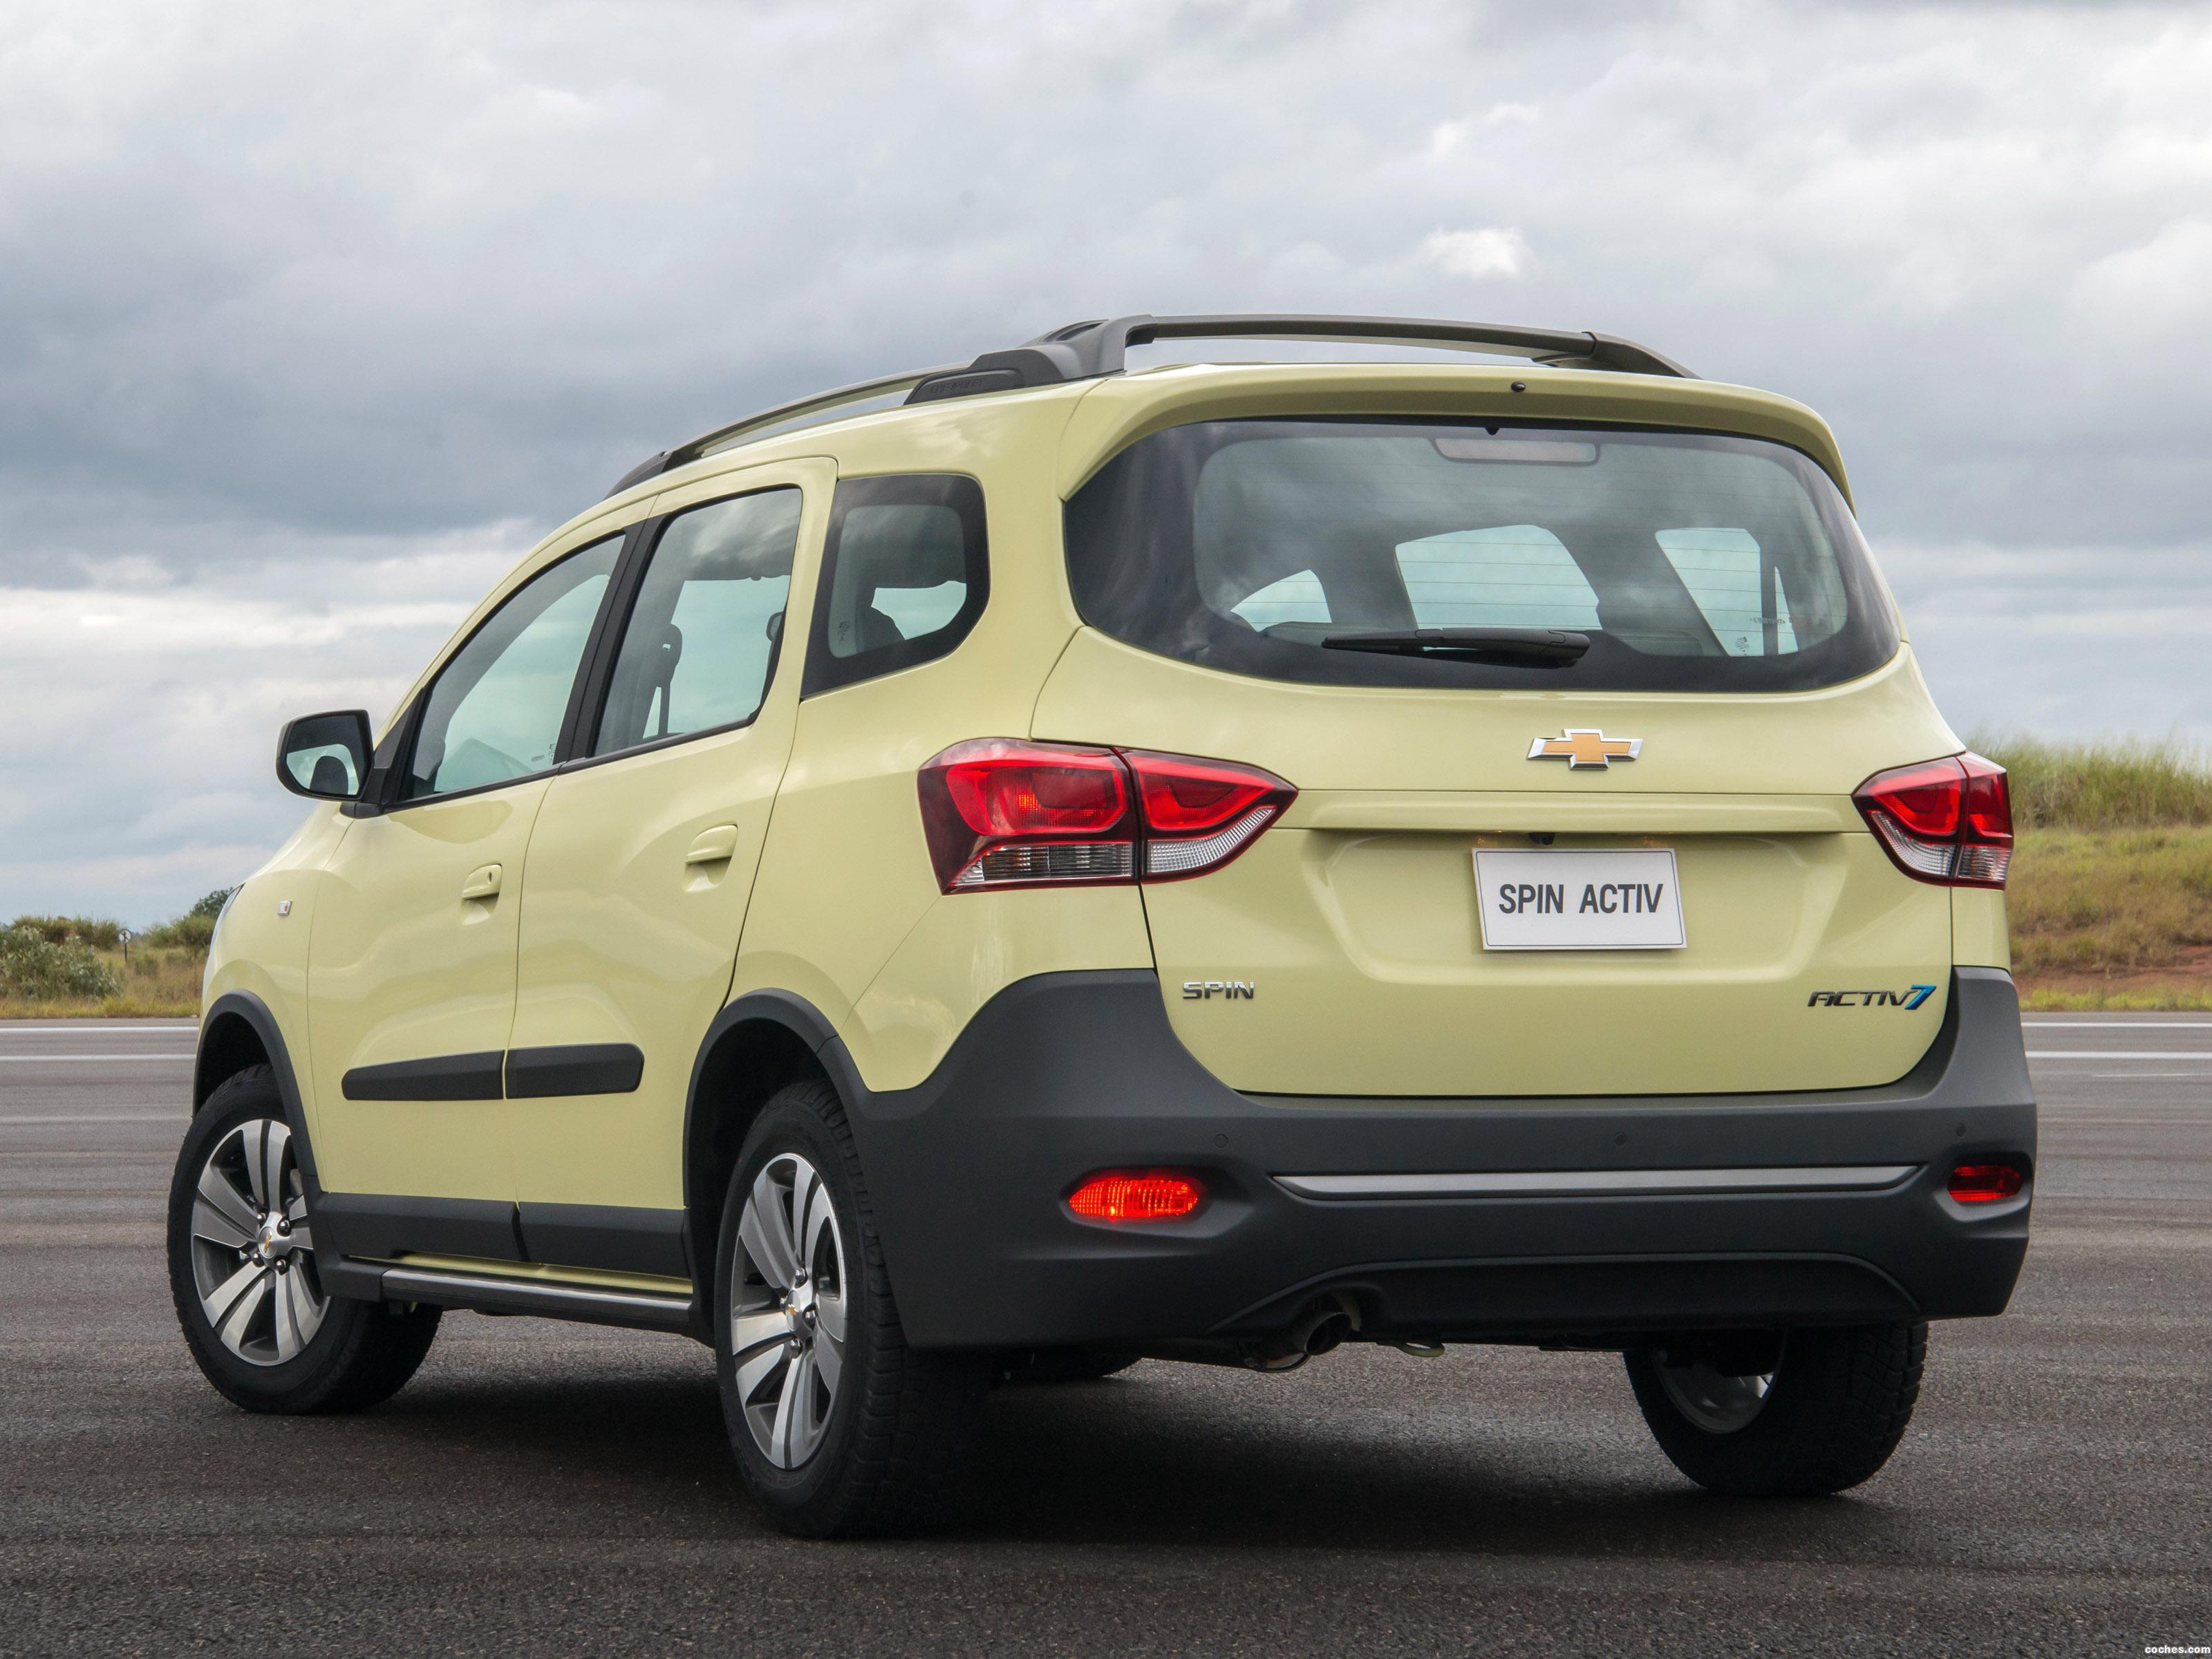 Foto 2 de Chevrolet Spin Activ 2018